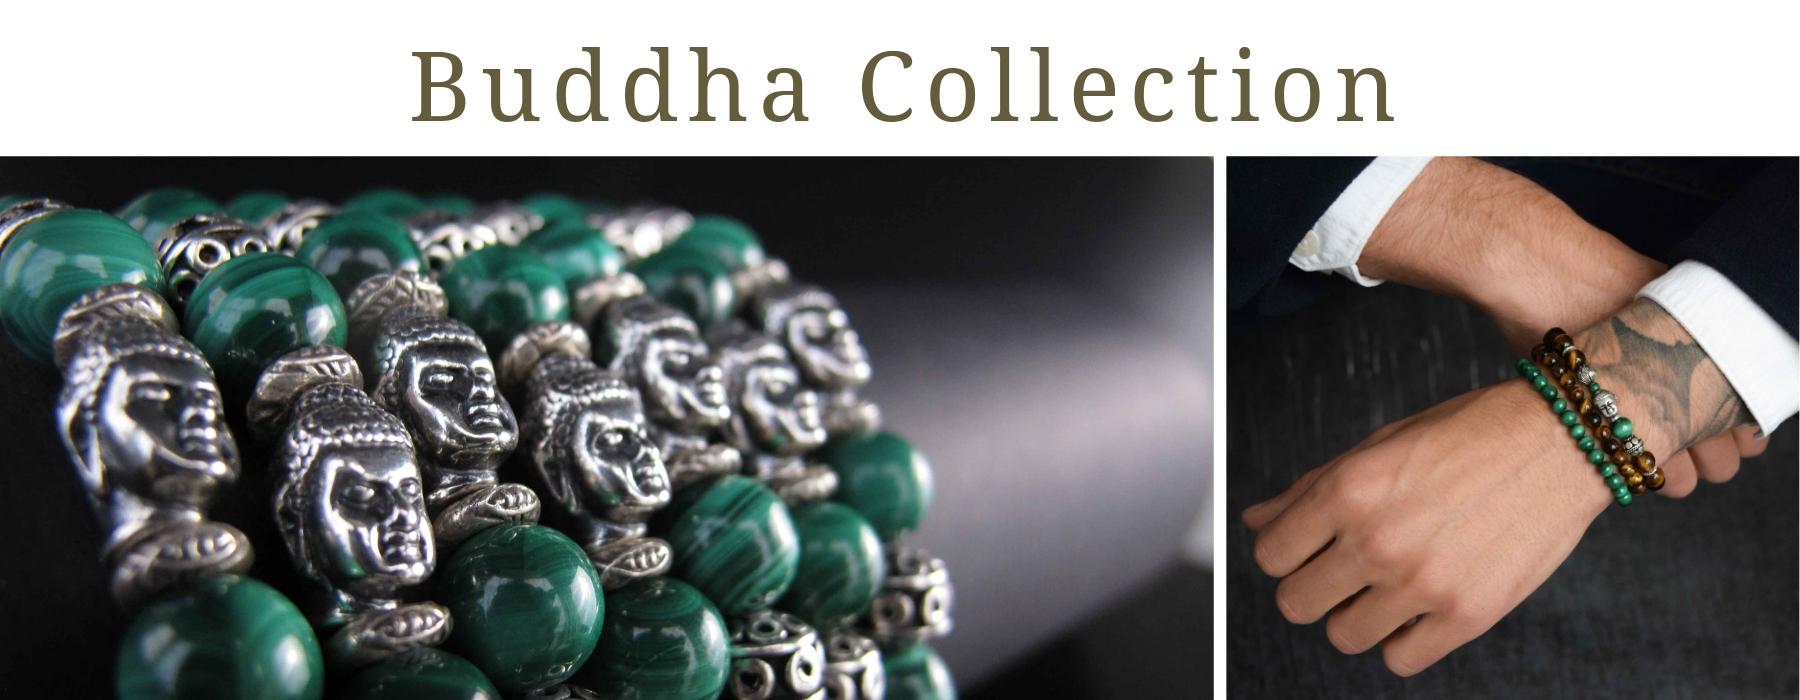 Men's Beaded Bracelets UK, buddha bracelets, spiritual bracelets, healing jewellery, designer bracelets, crystal jewellery